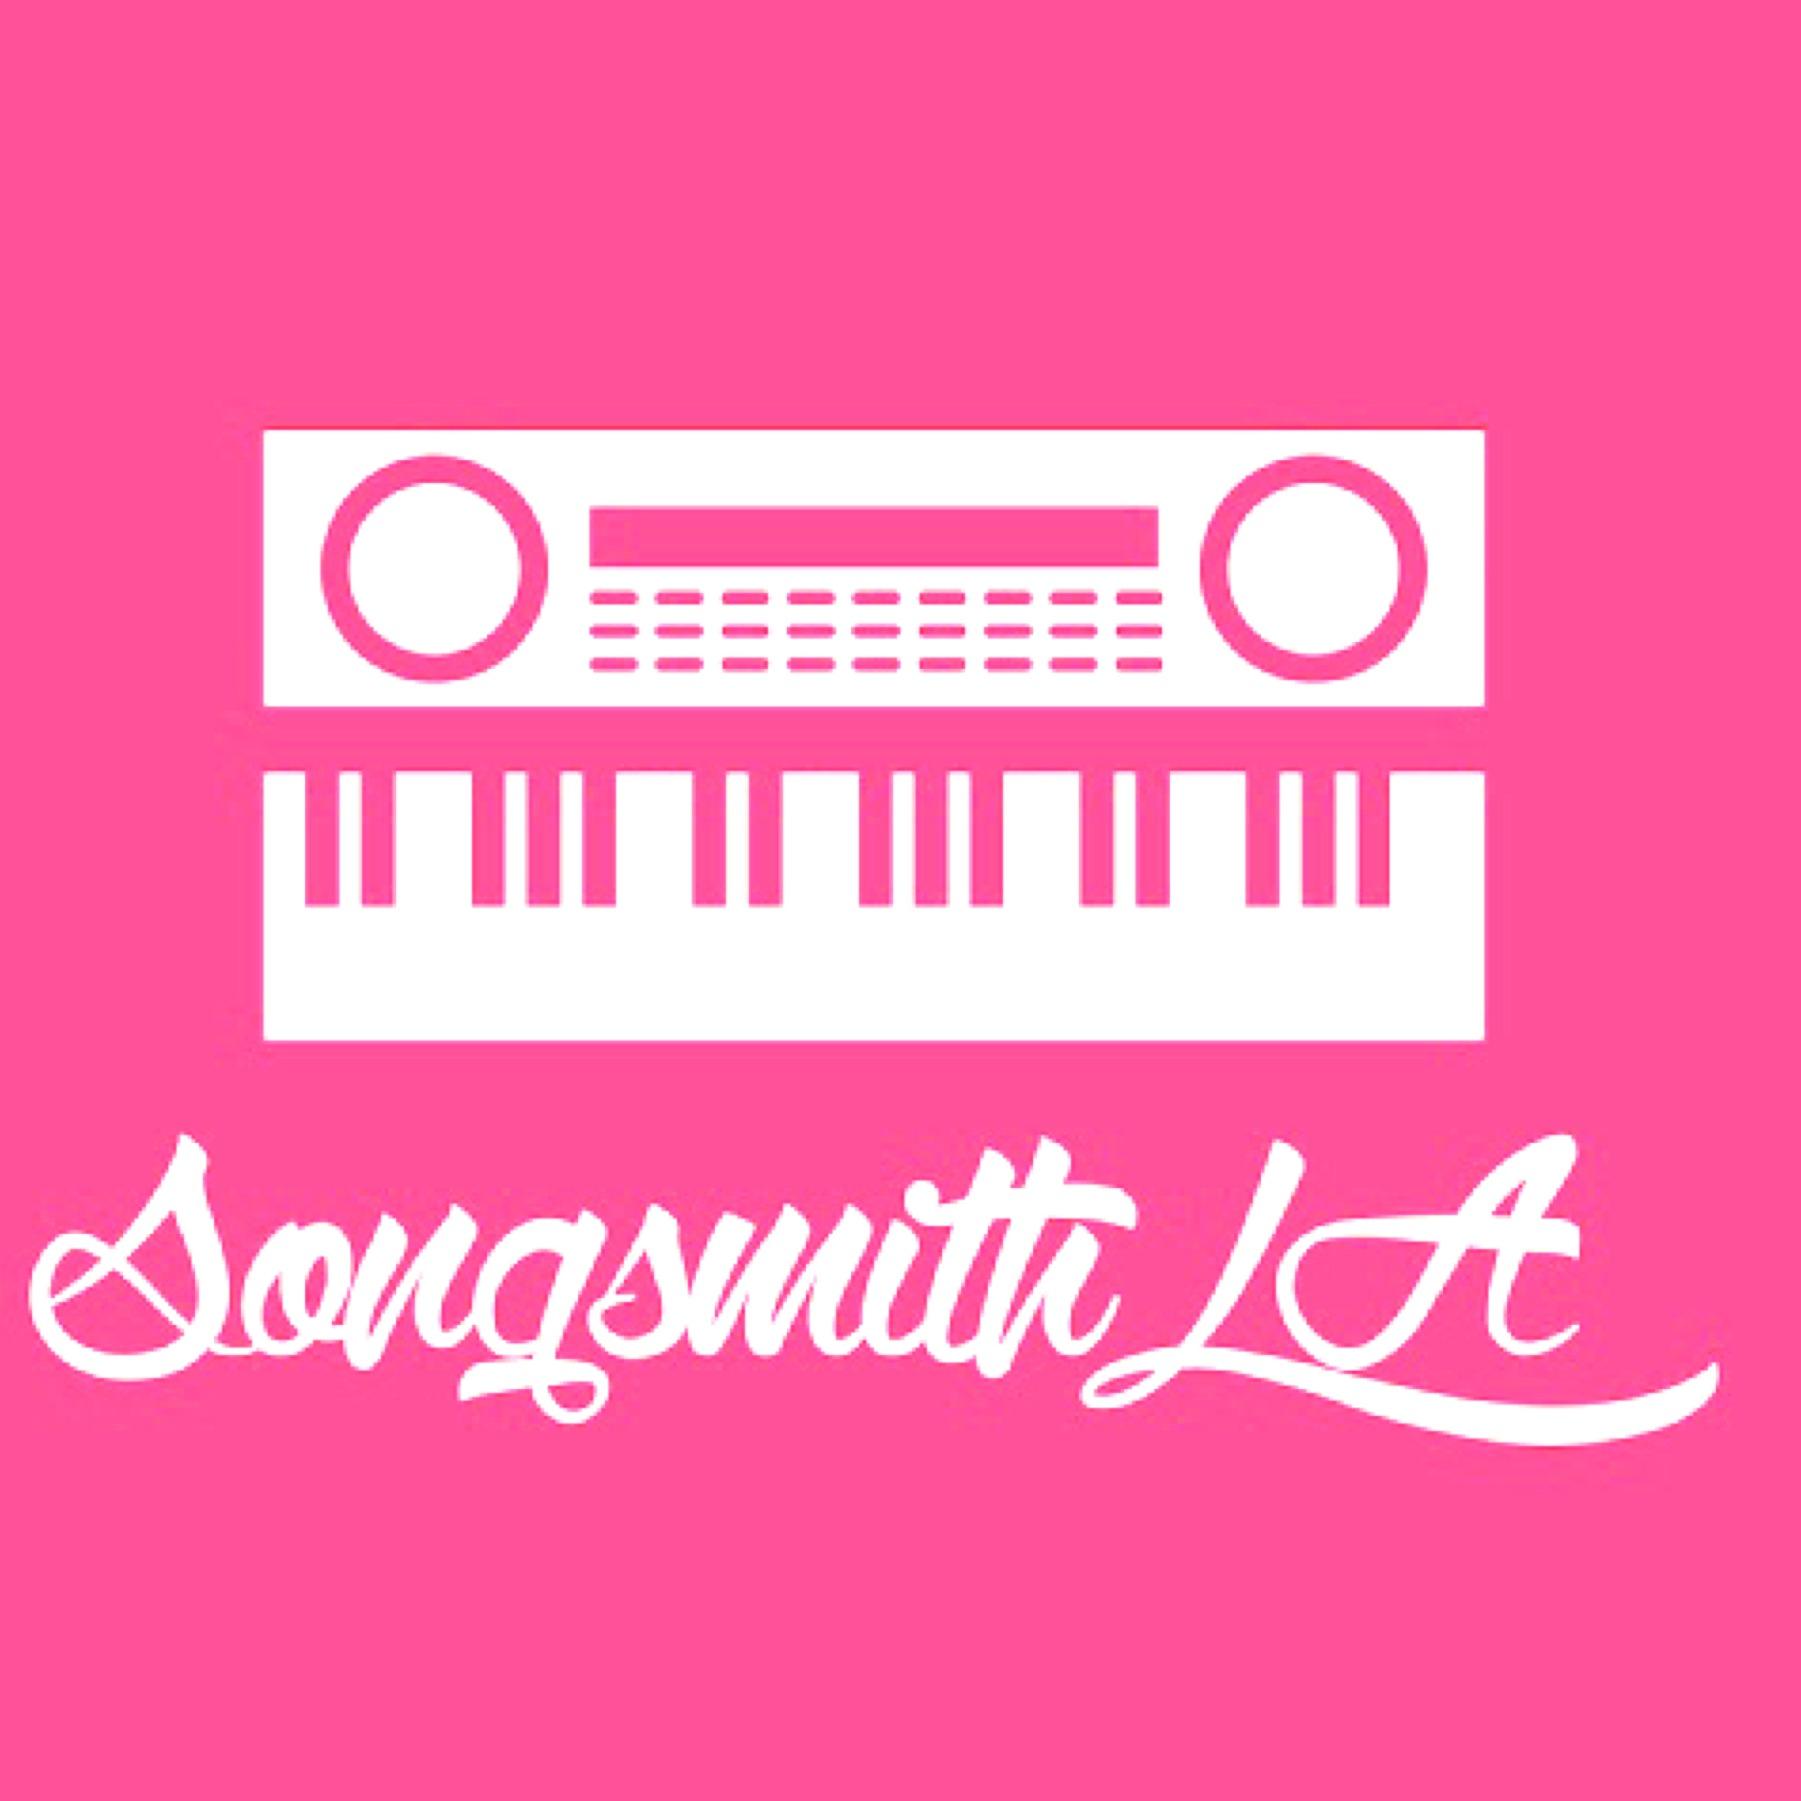 Songsmith LA Music Academy and Community